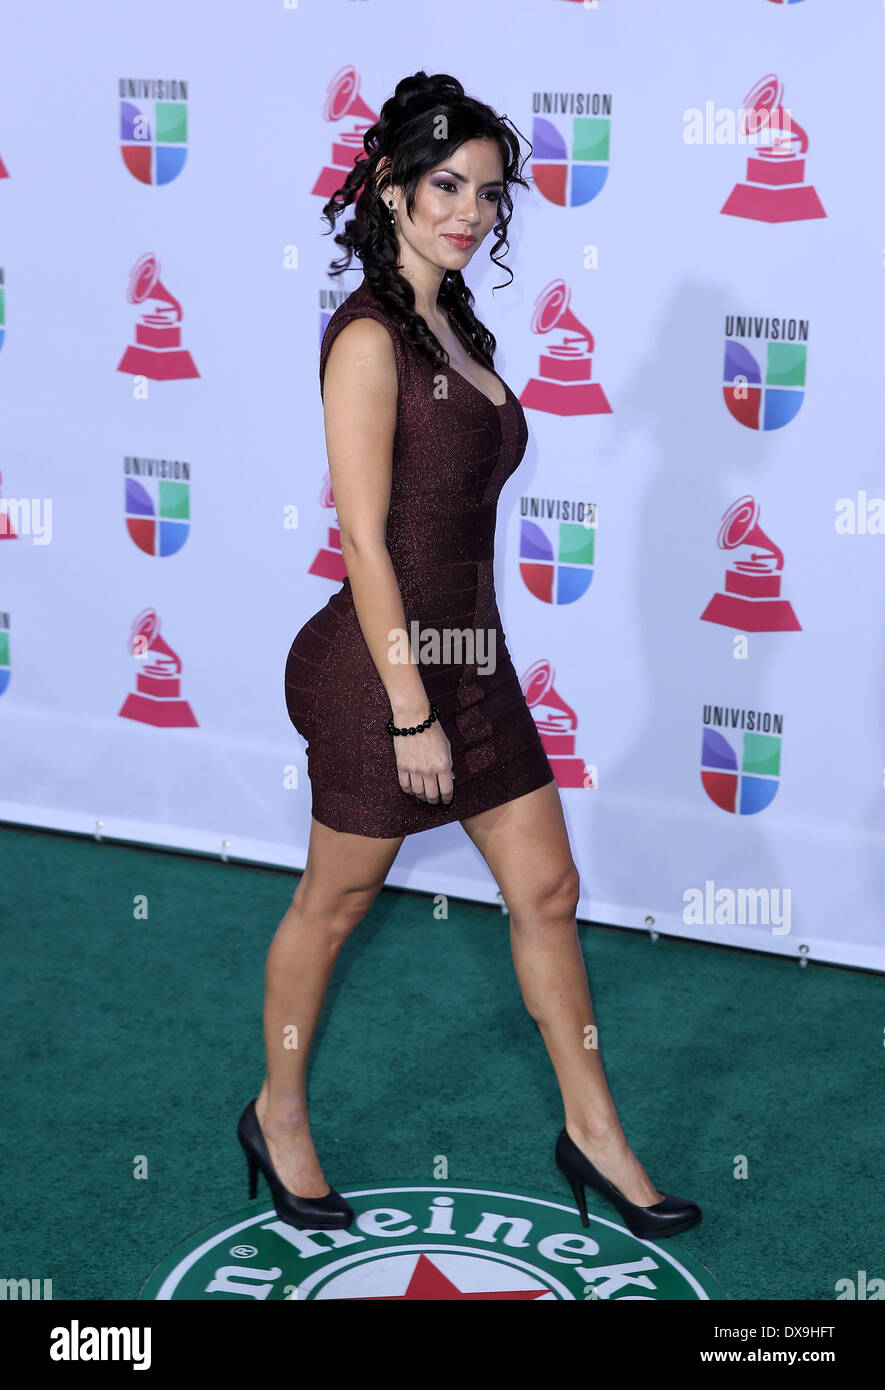 Mariann Gavelo 13th Annual Latin Grammy Awards held at the Mandalay Bay Resort and Casino - Arrivals Las Vegas, Stock Photo